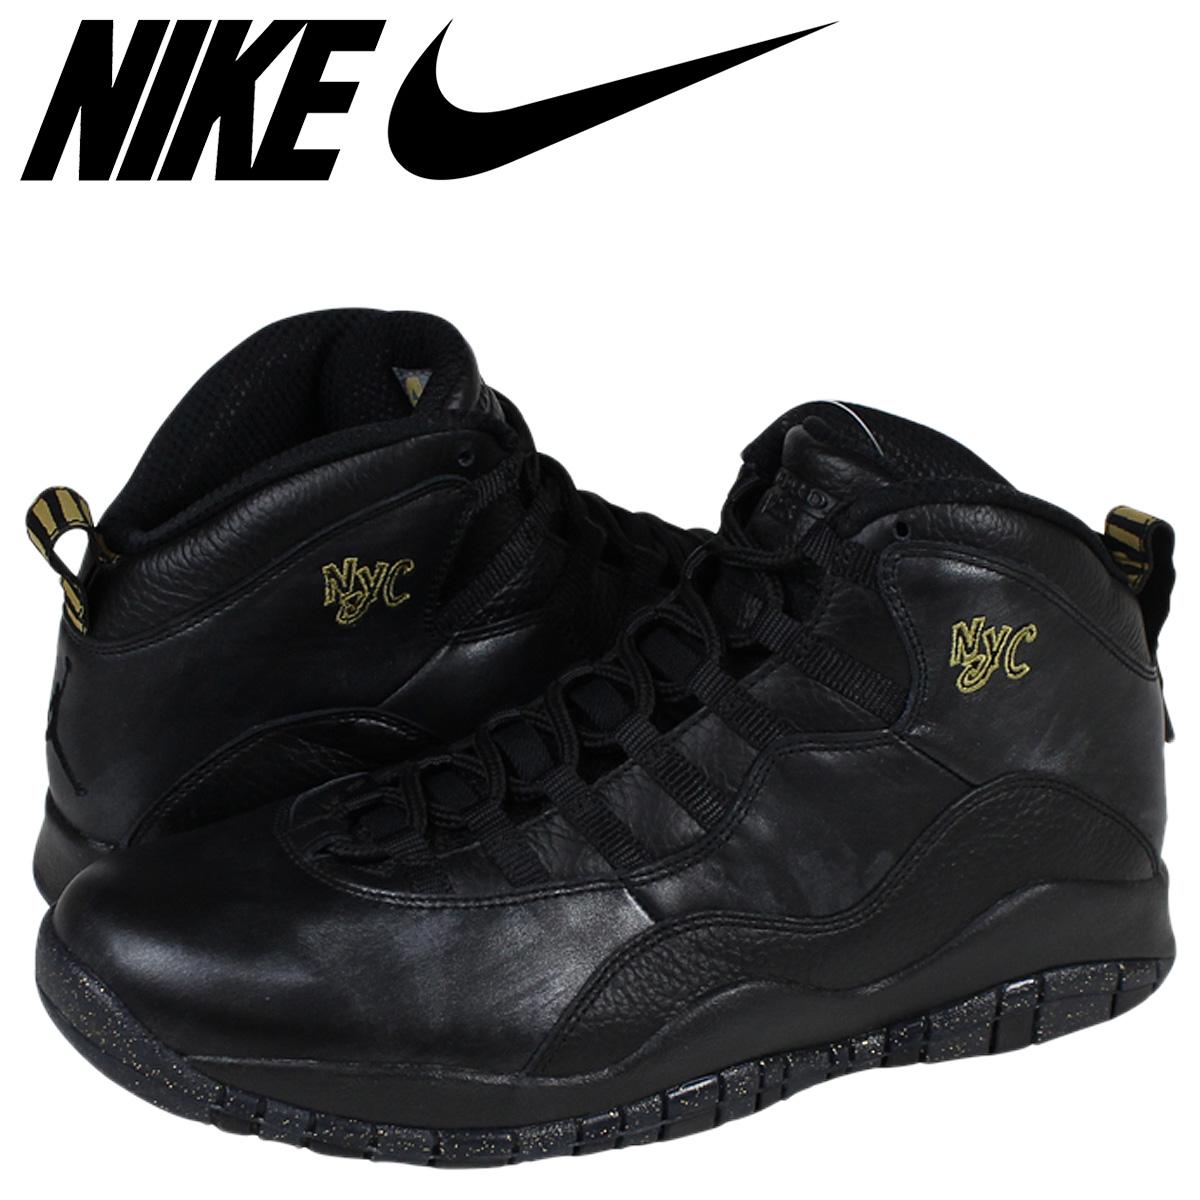 separation shoes e87ff 0f45b NIKE Nike Air Jordan sneakers AIR JORDAN 10 RETRO NYC Air Jordan 10 retro  310805 - 012 black mens